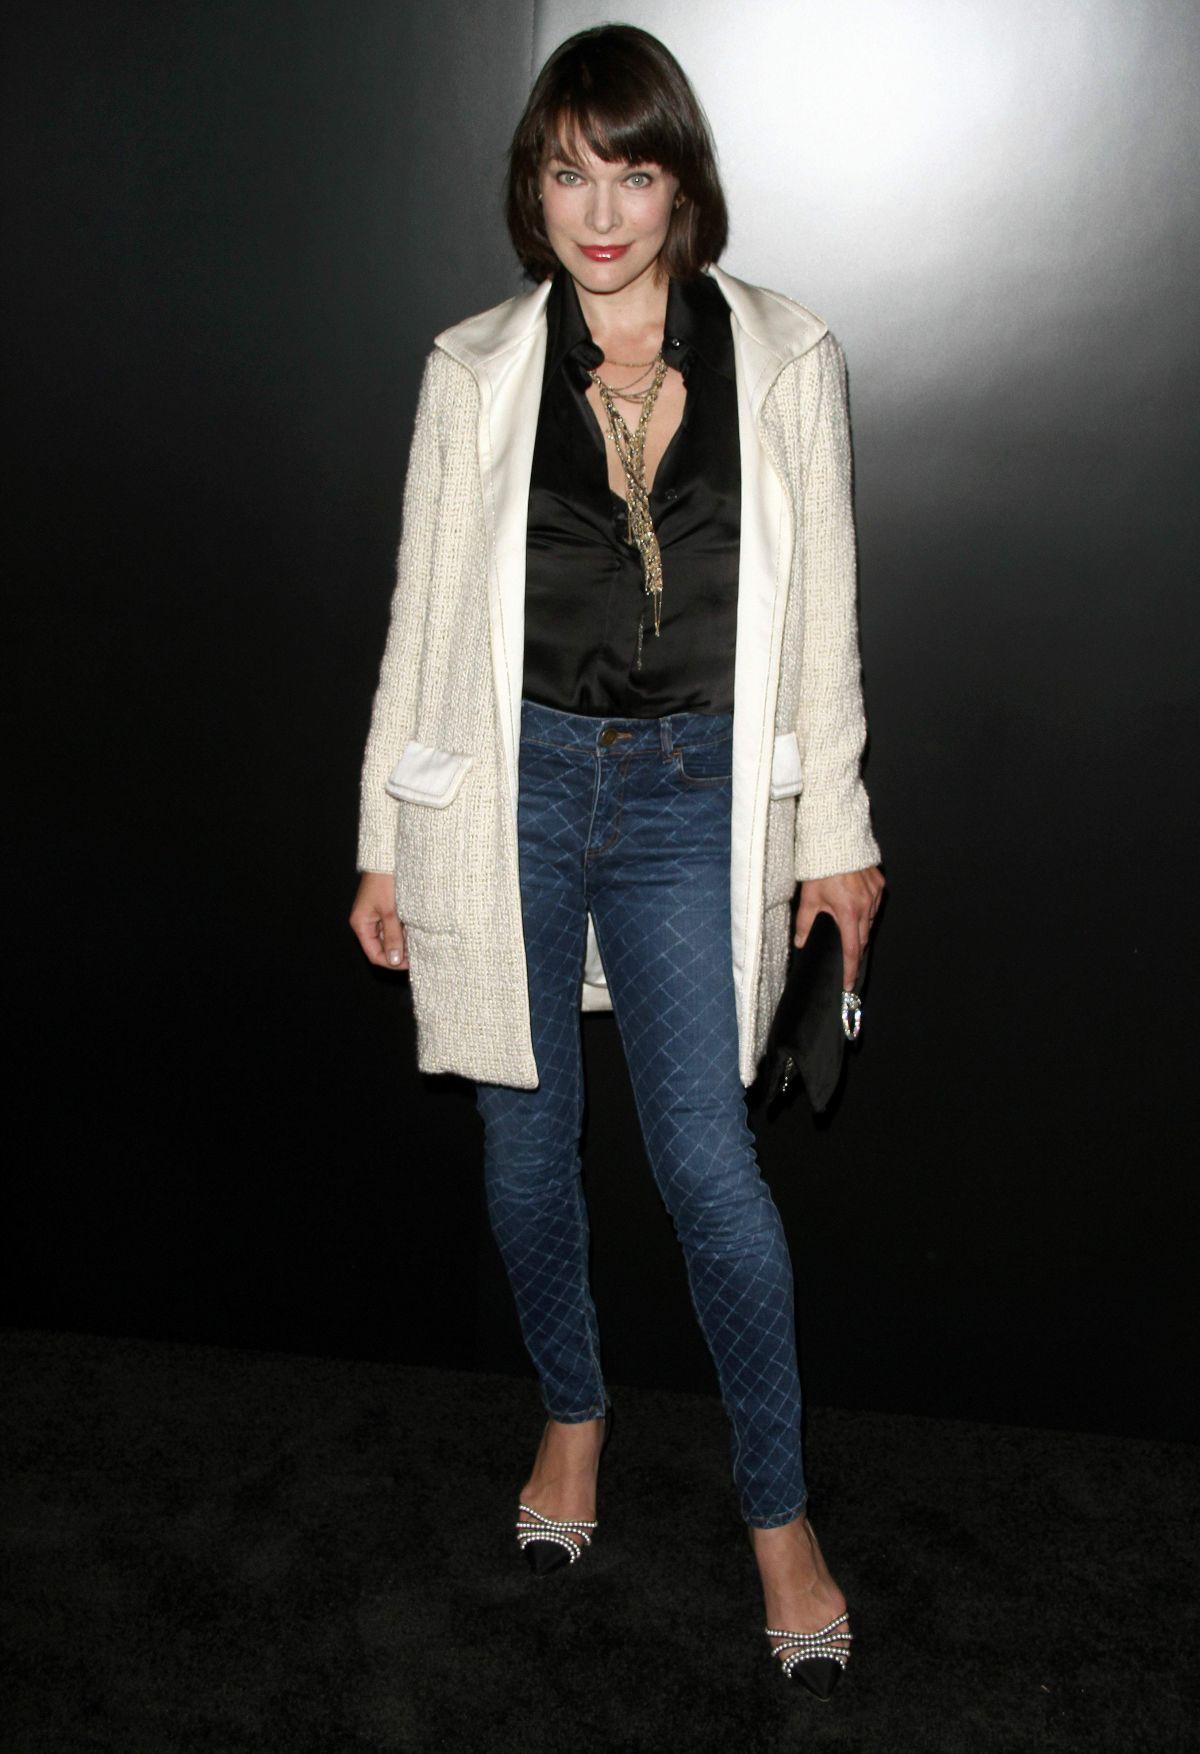 MILLA JOVOVICH at Chanel Celebrates Launch of No.5 L'Eau in Los Angeles 09/22/2016